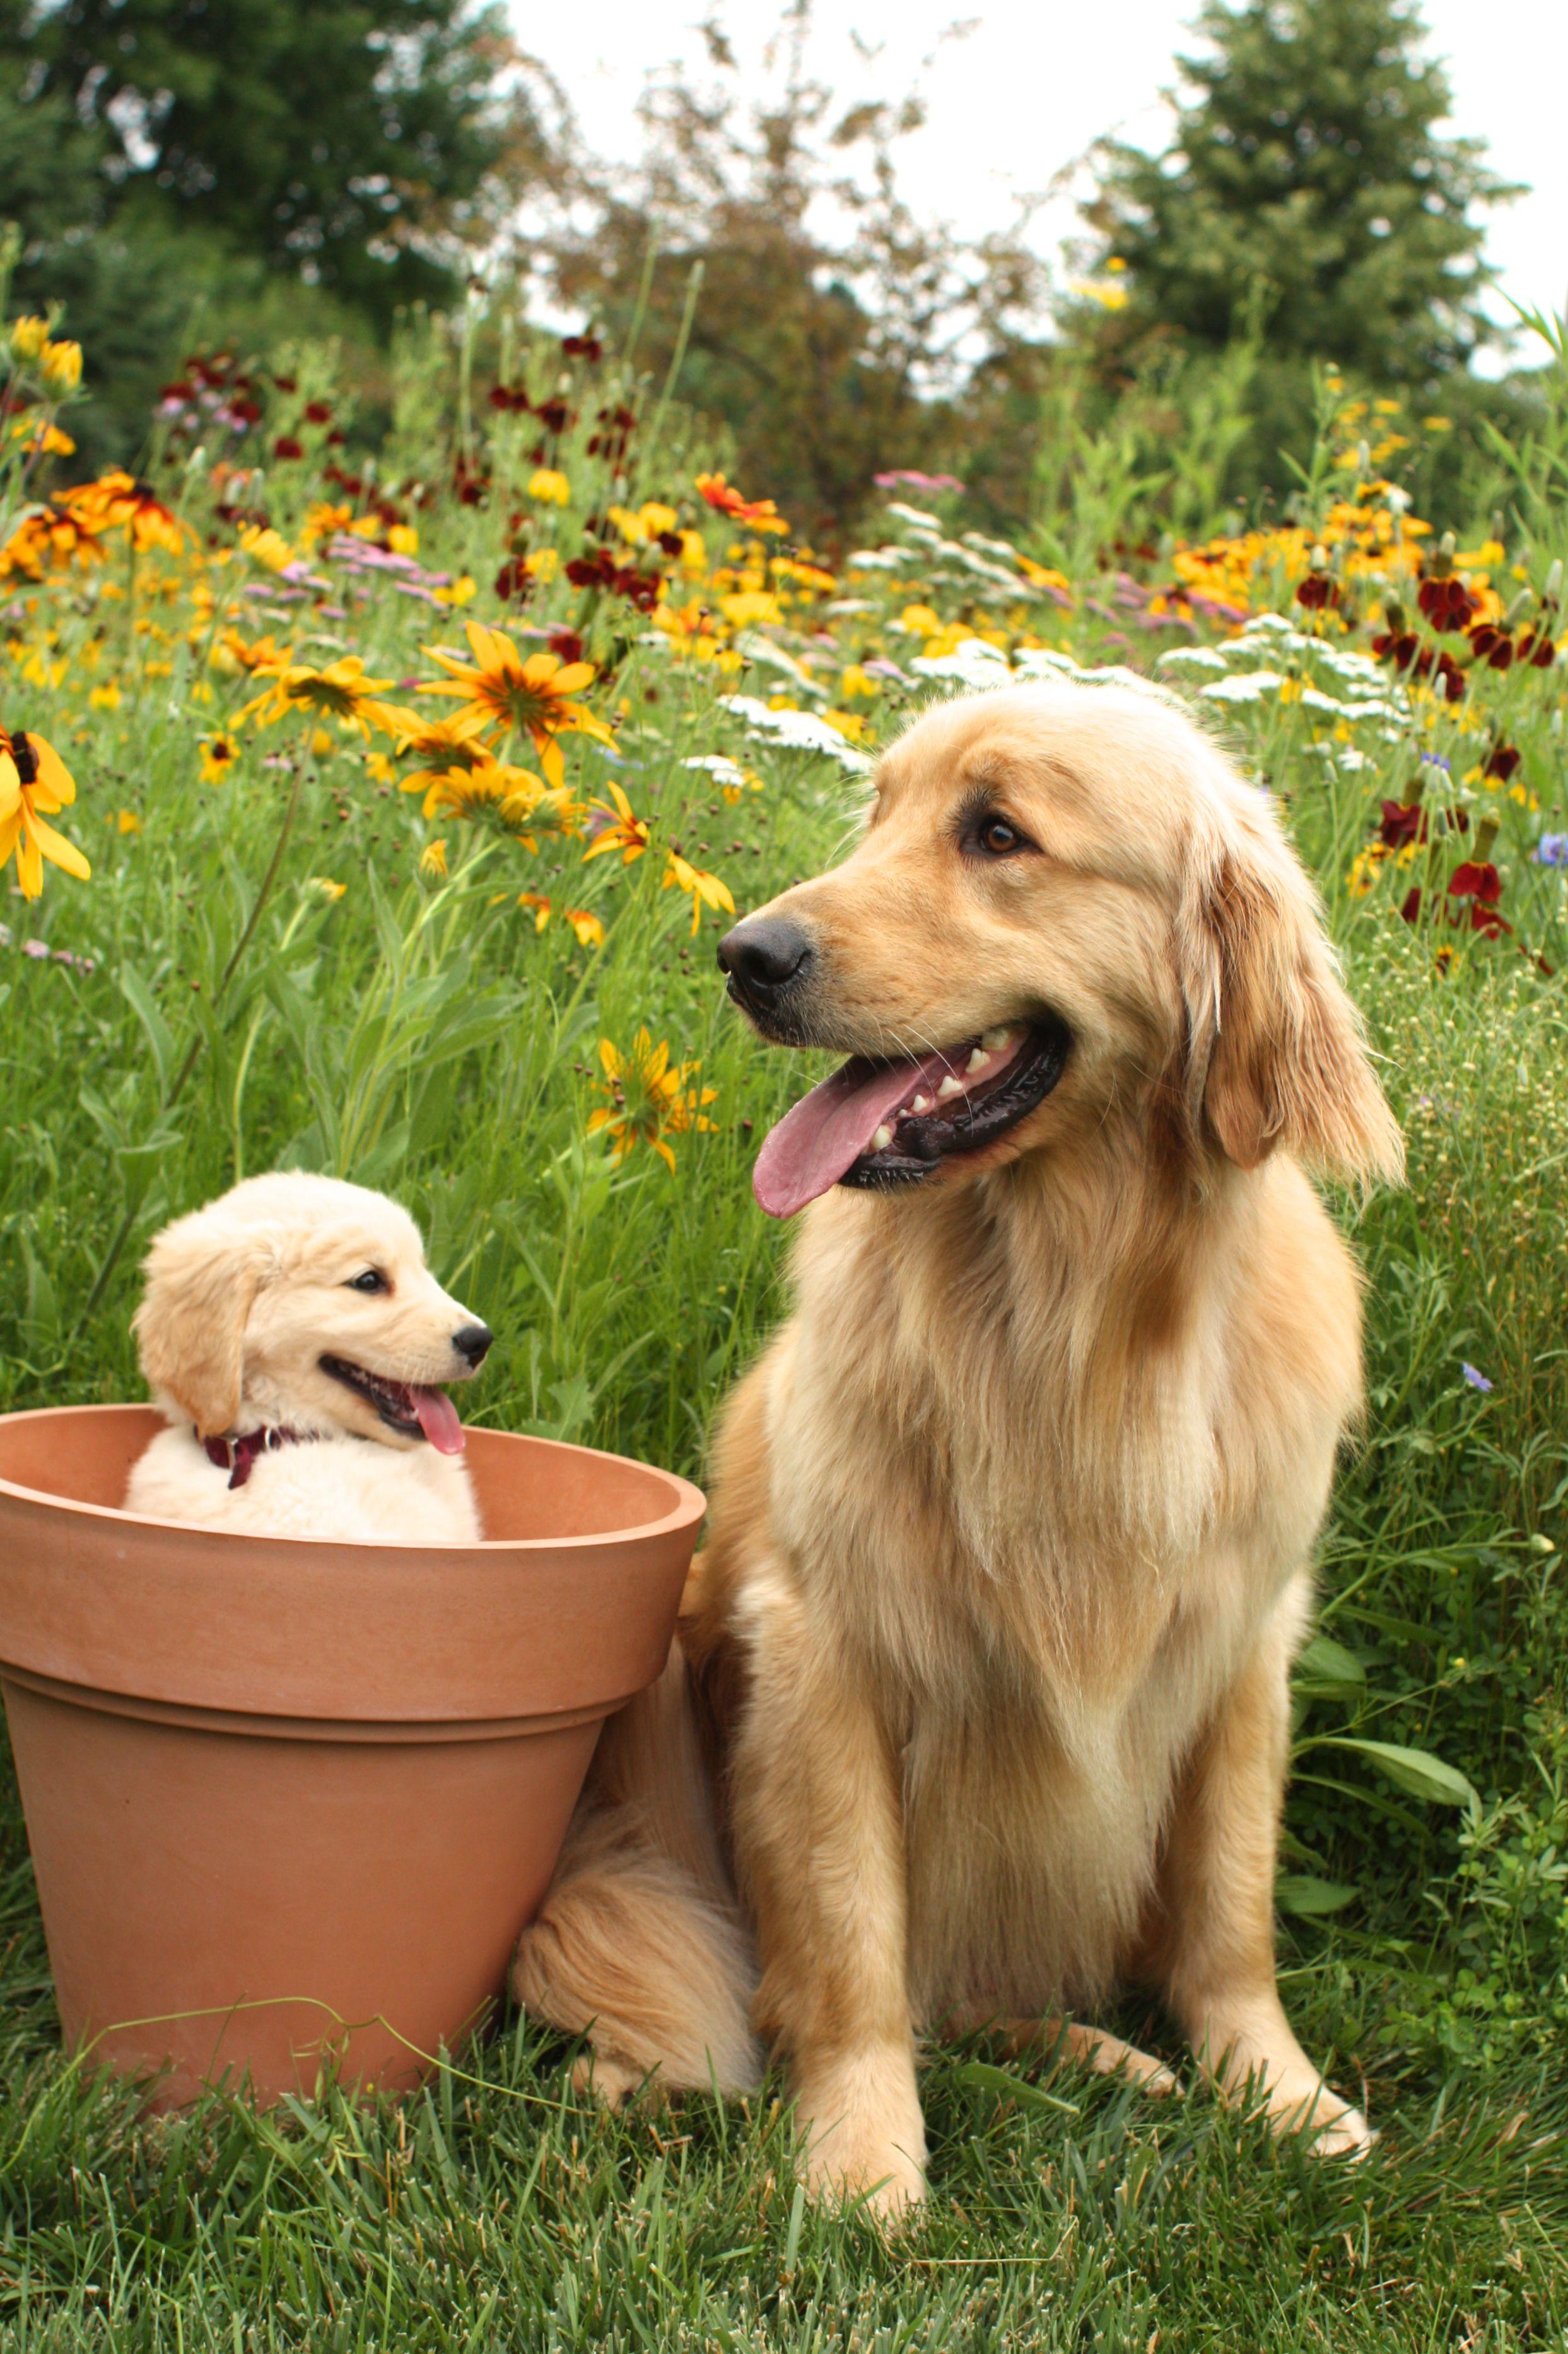 Pin By Carolyn Clark On Animaux Retriever Puppy Golden Retriever Retriever